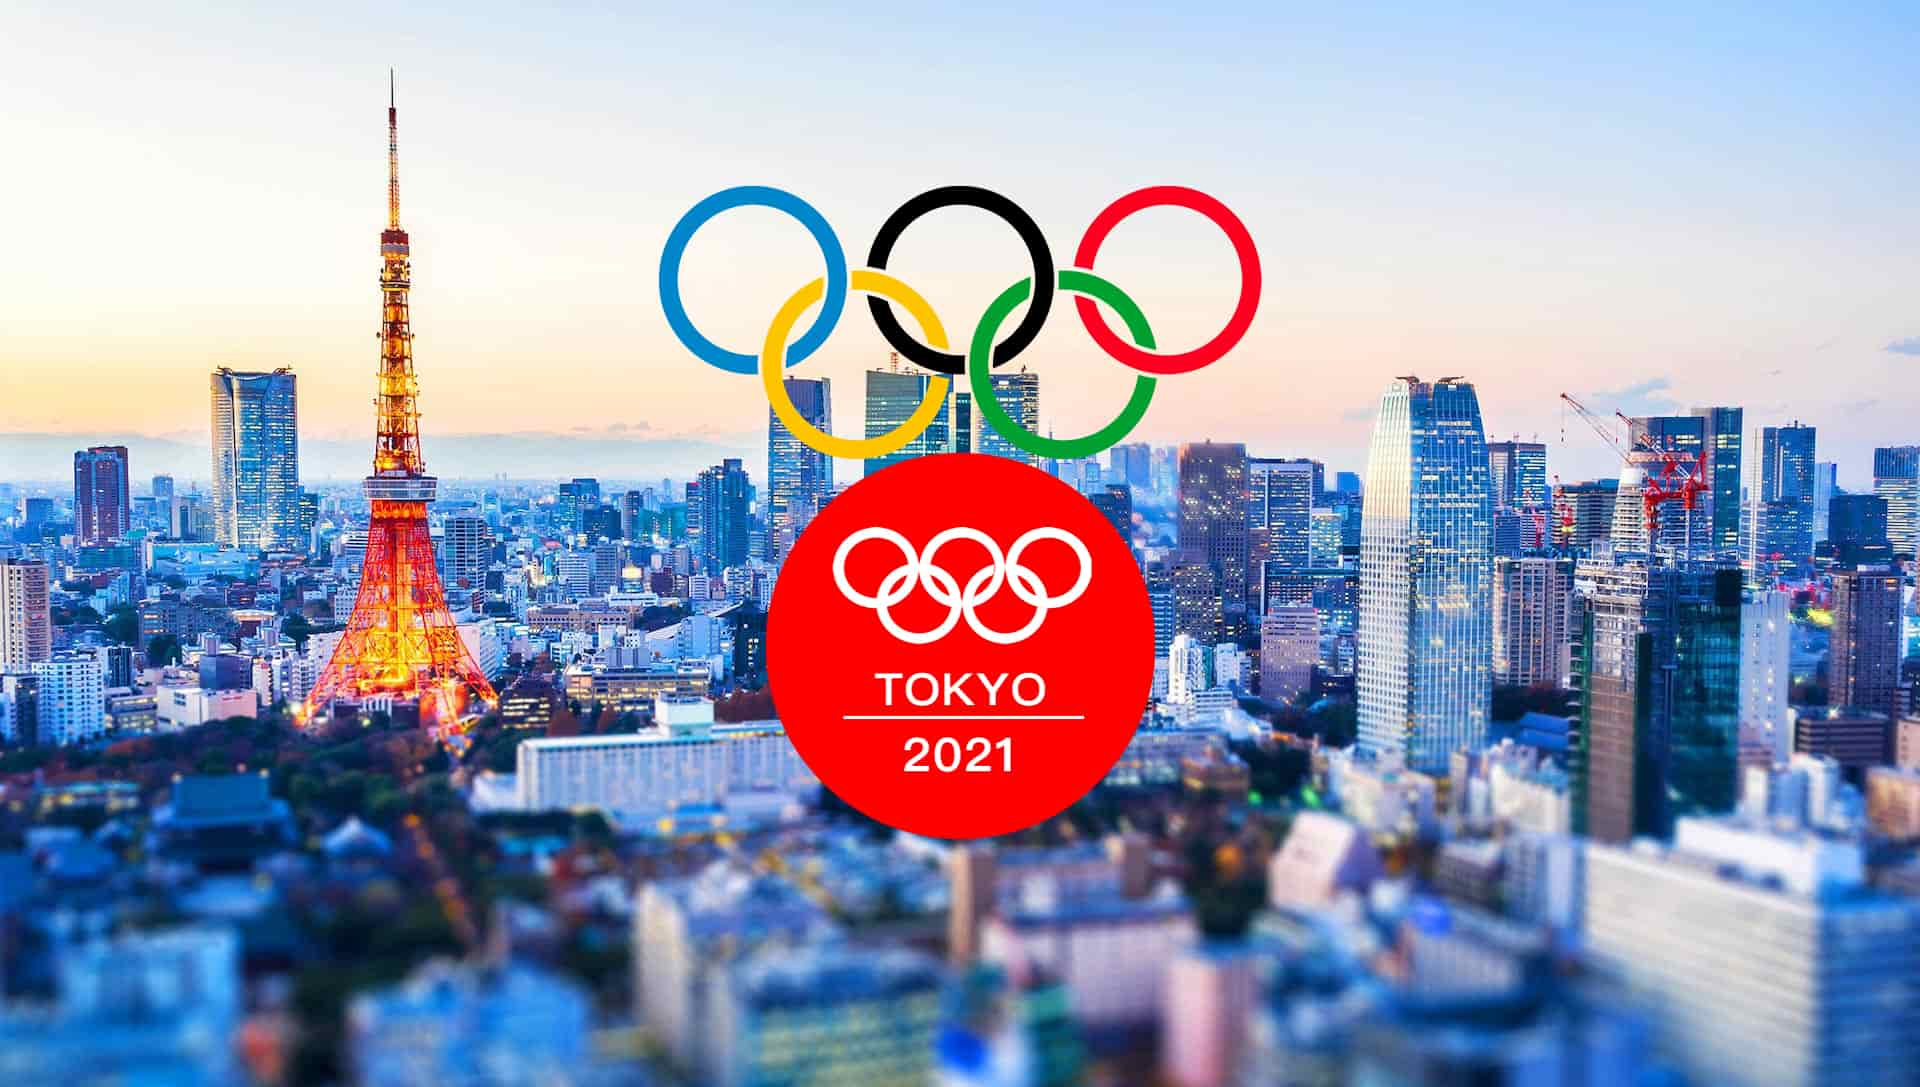 Olympics opening ceremony director sacked for 1990 Holocaust joke